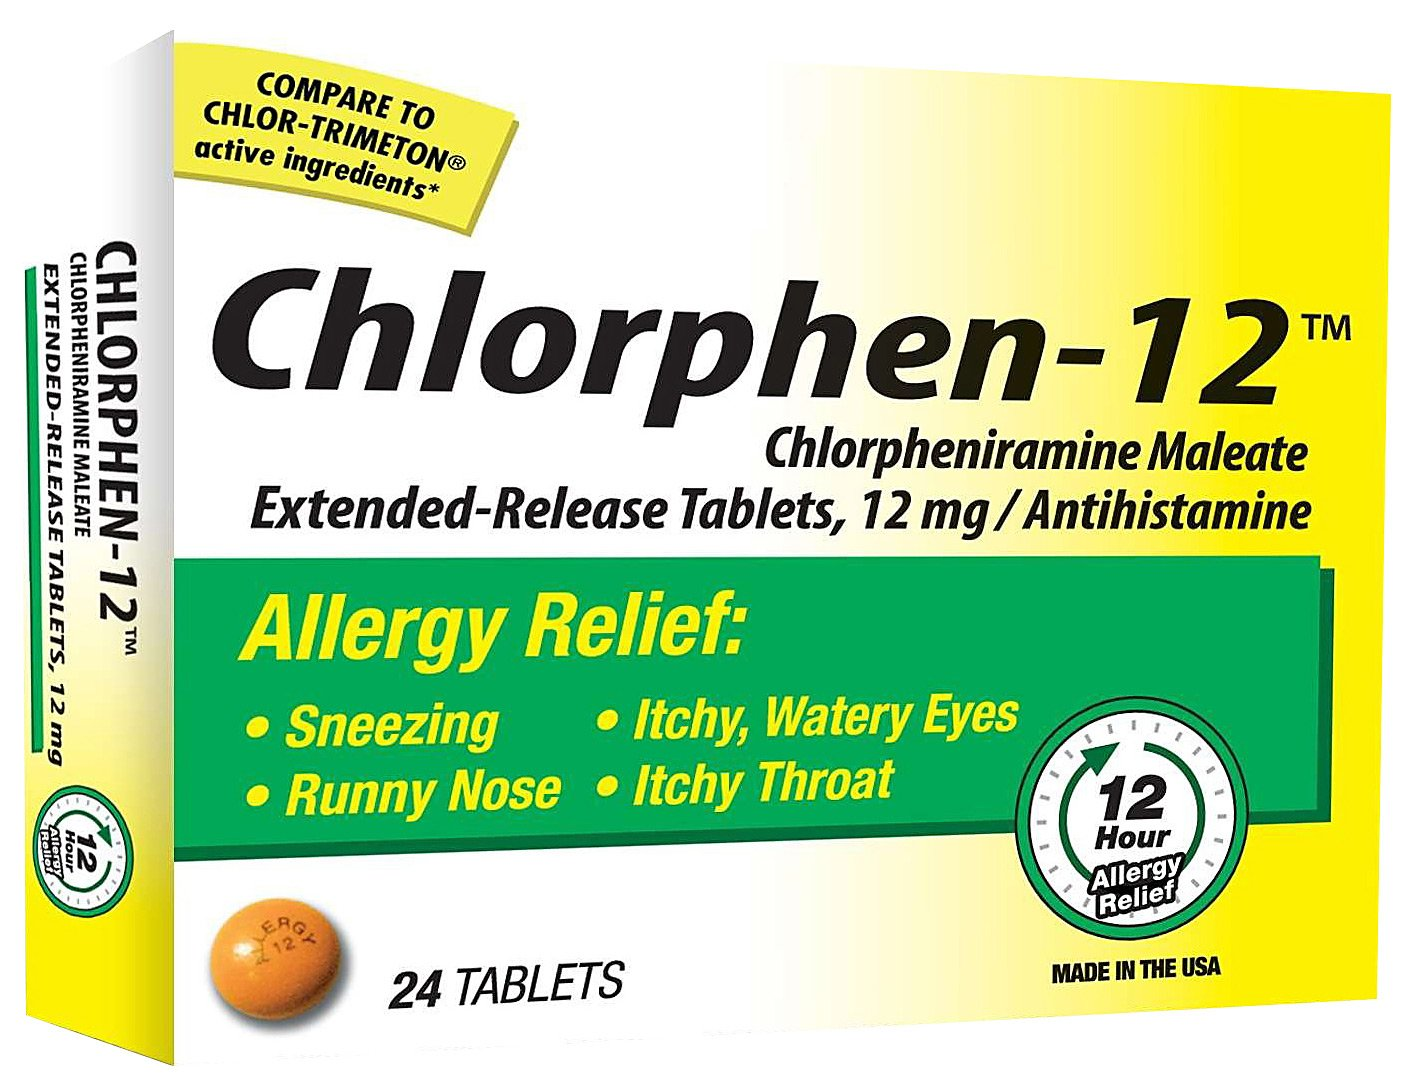 Chlorpheniramine Maleate Uses, Side Effects and ...